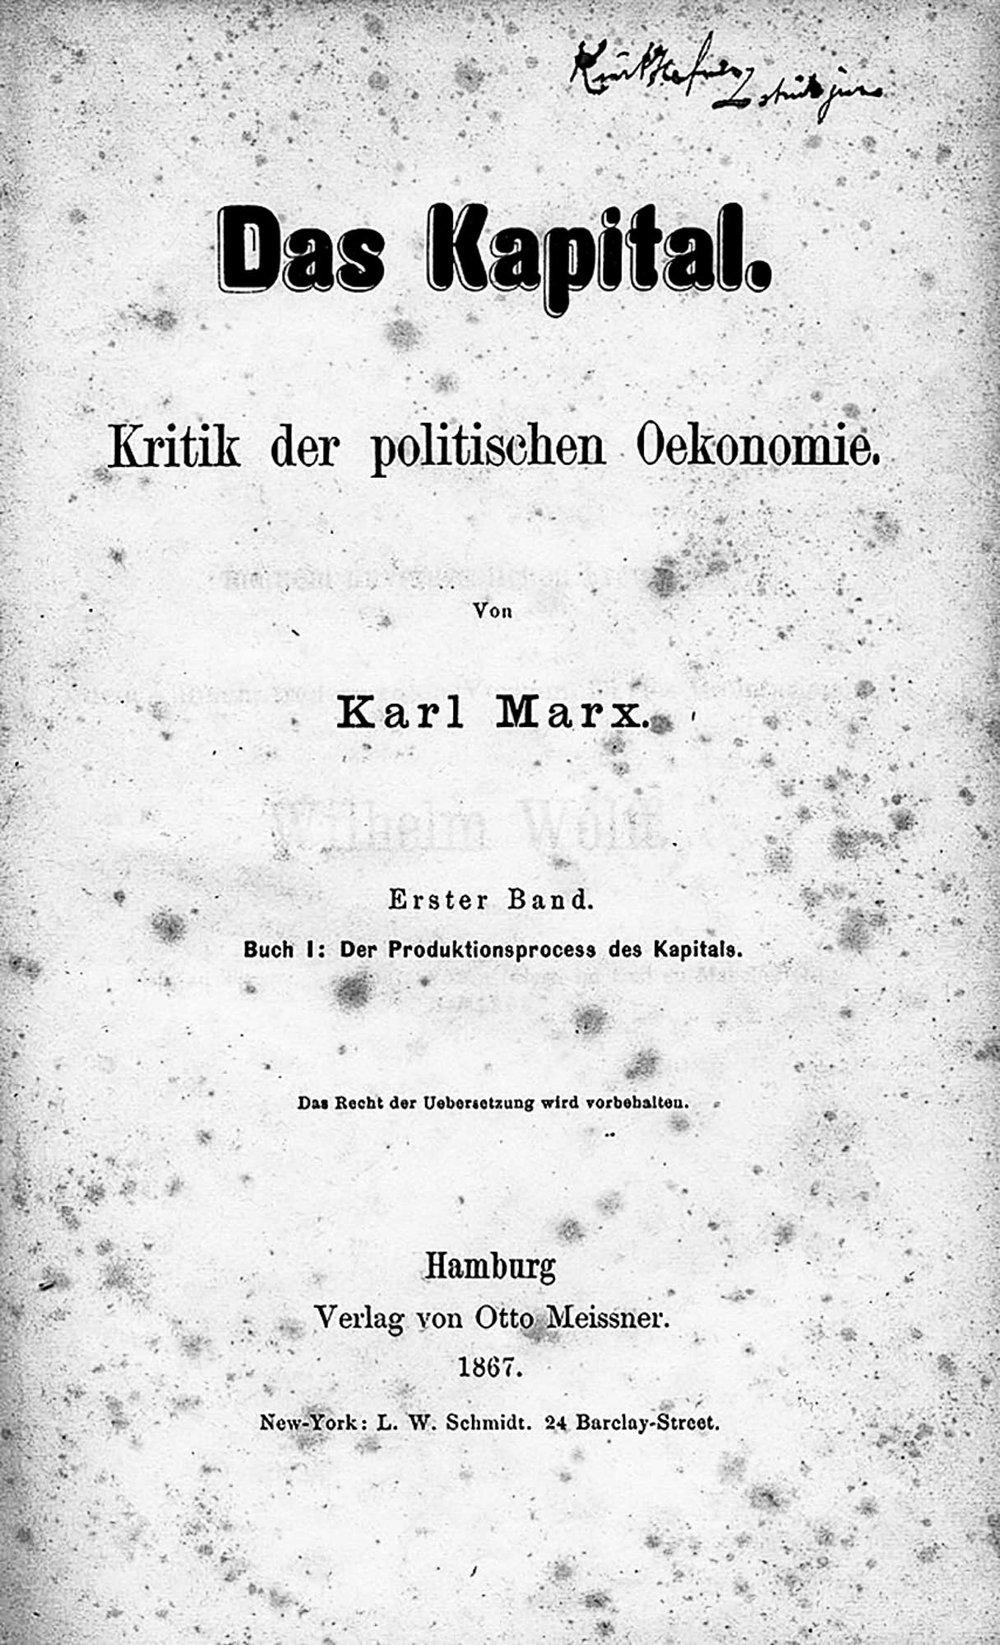 SP_1 Das Kapital I 1867-854 x 1405-LR-Jonas.jpg